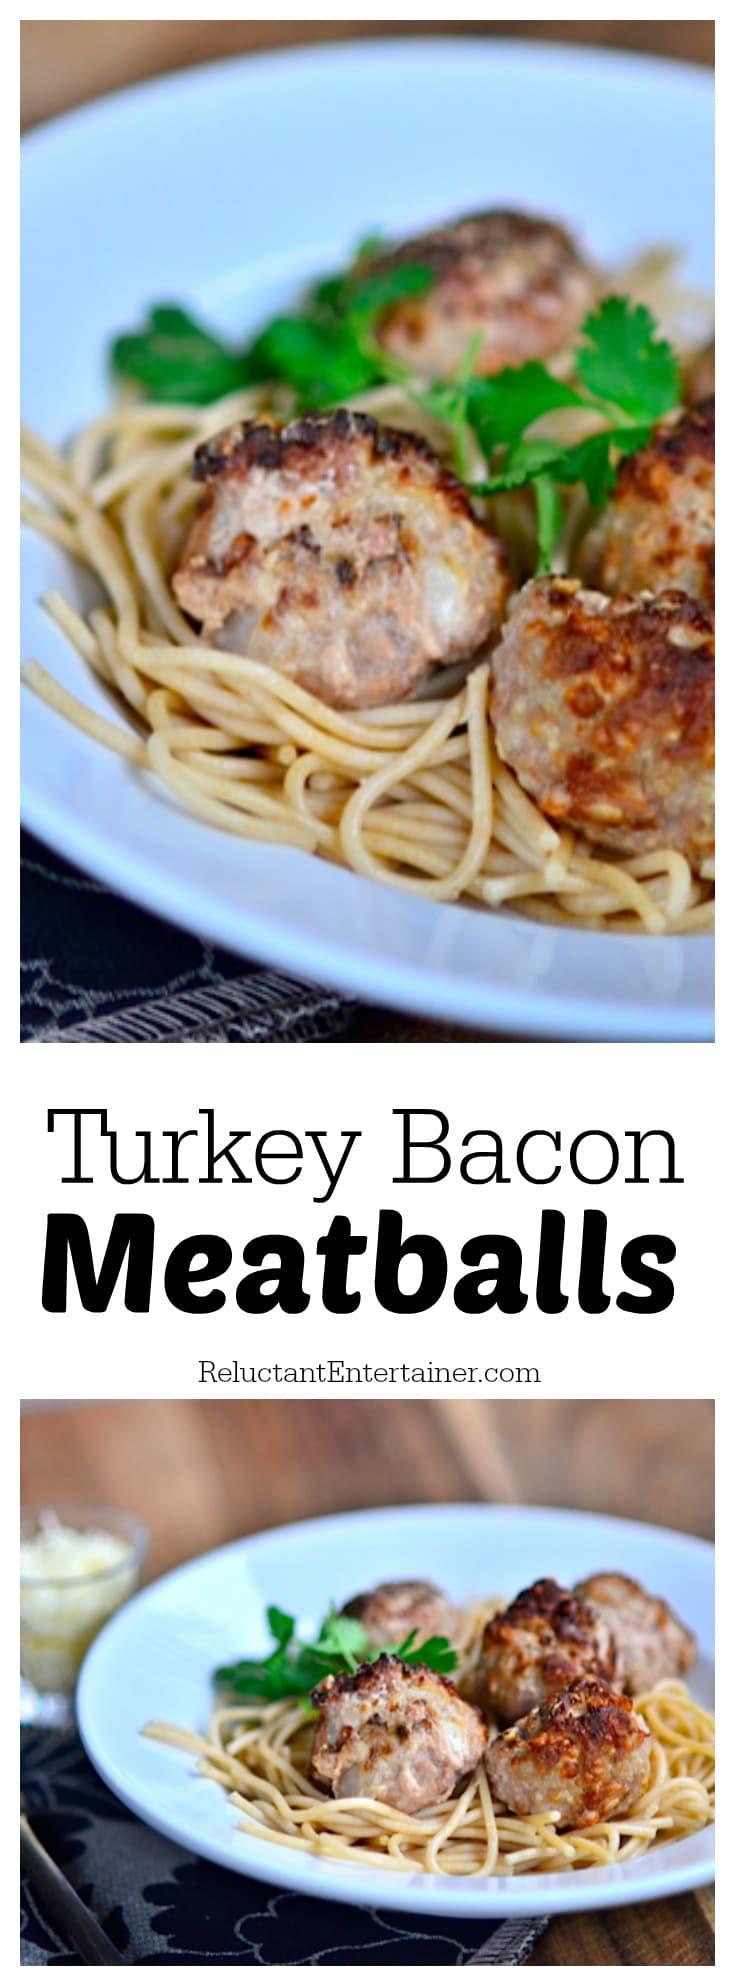 Turkey Bacon Meatballs Recipe